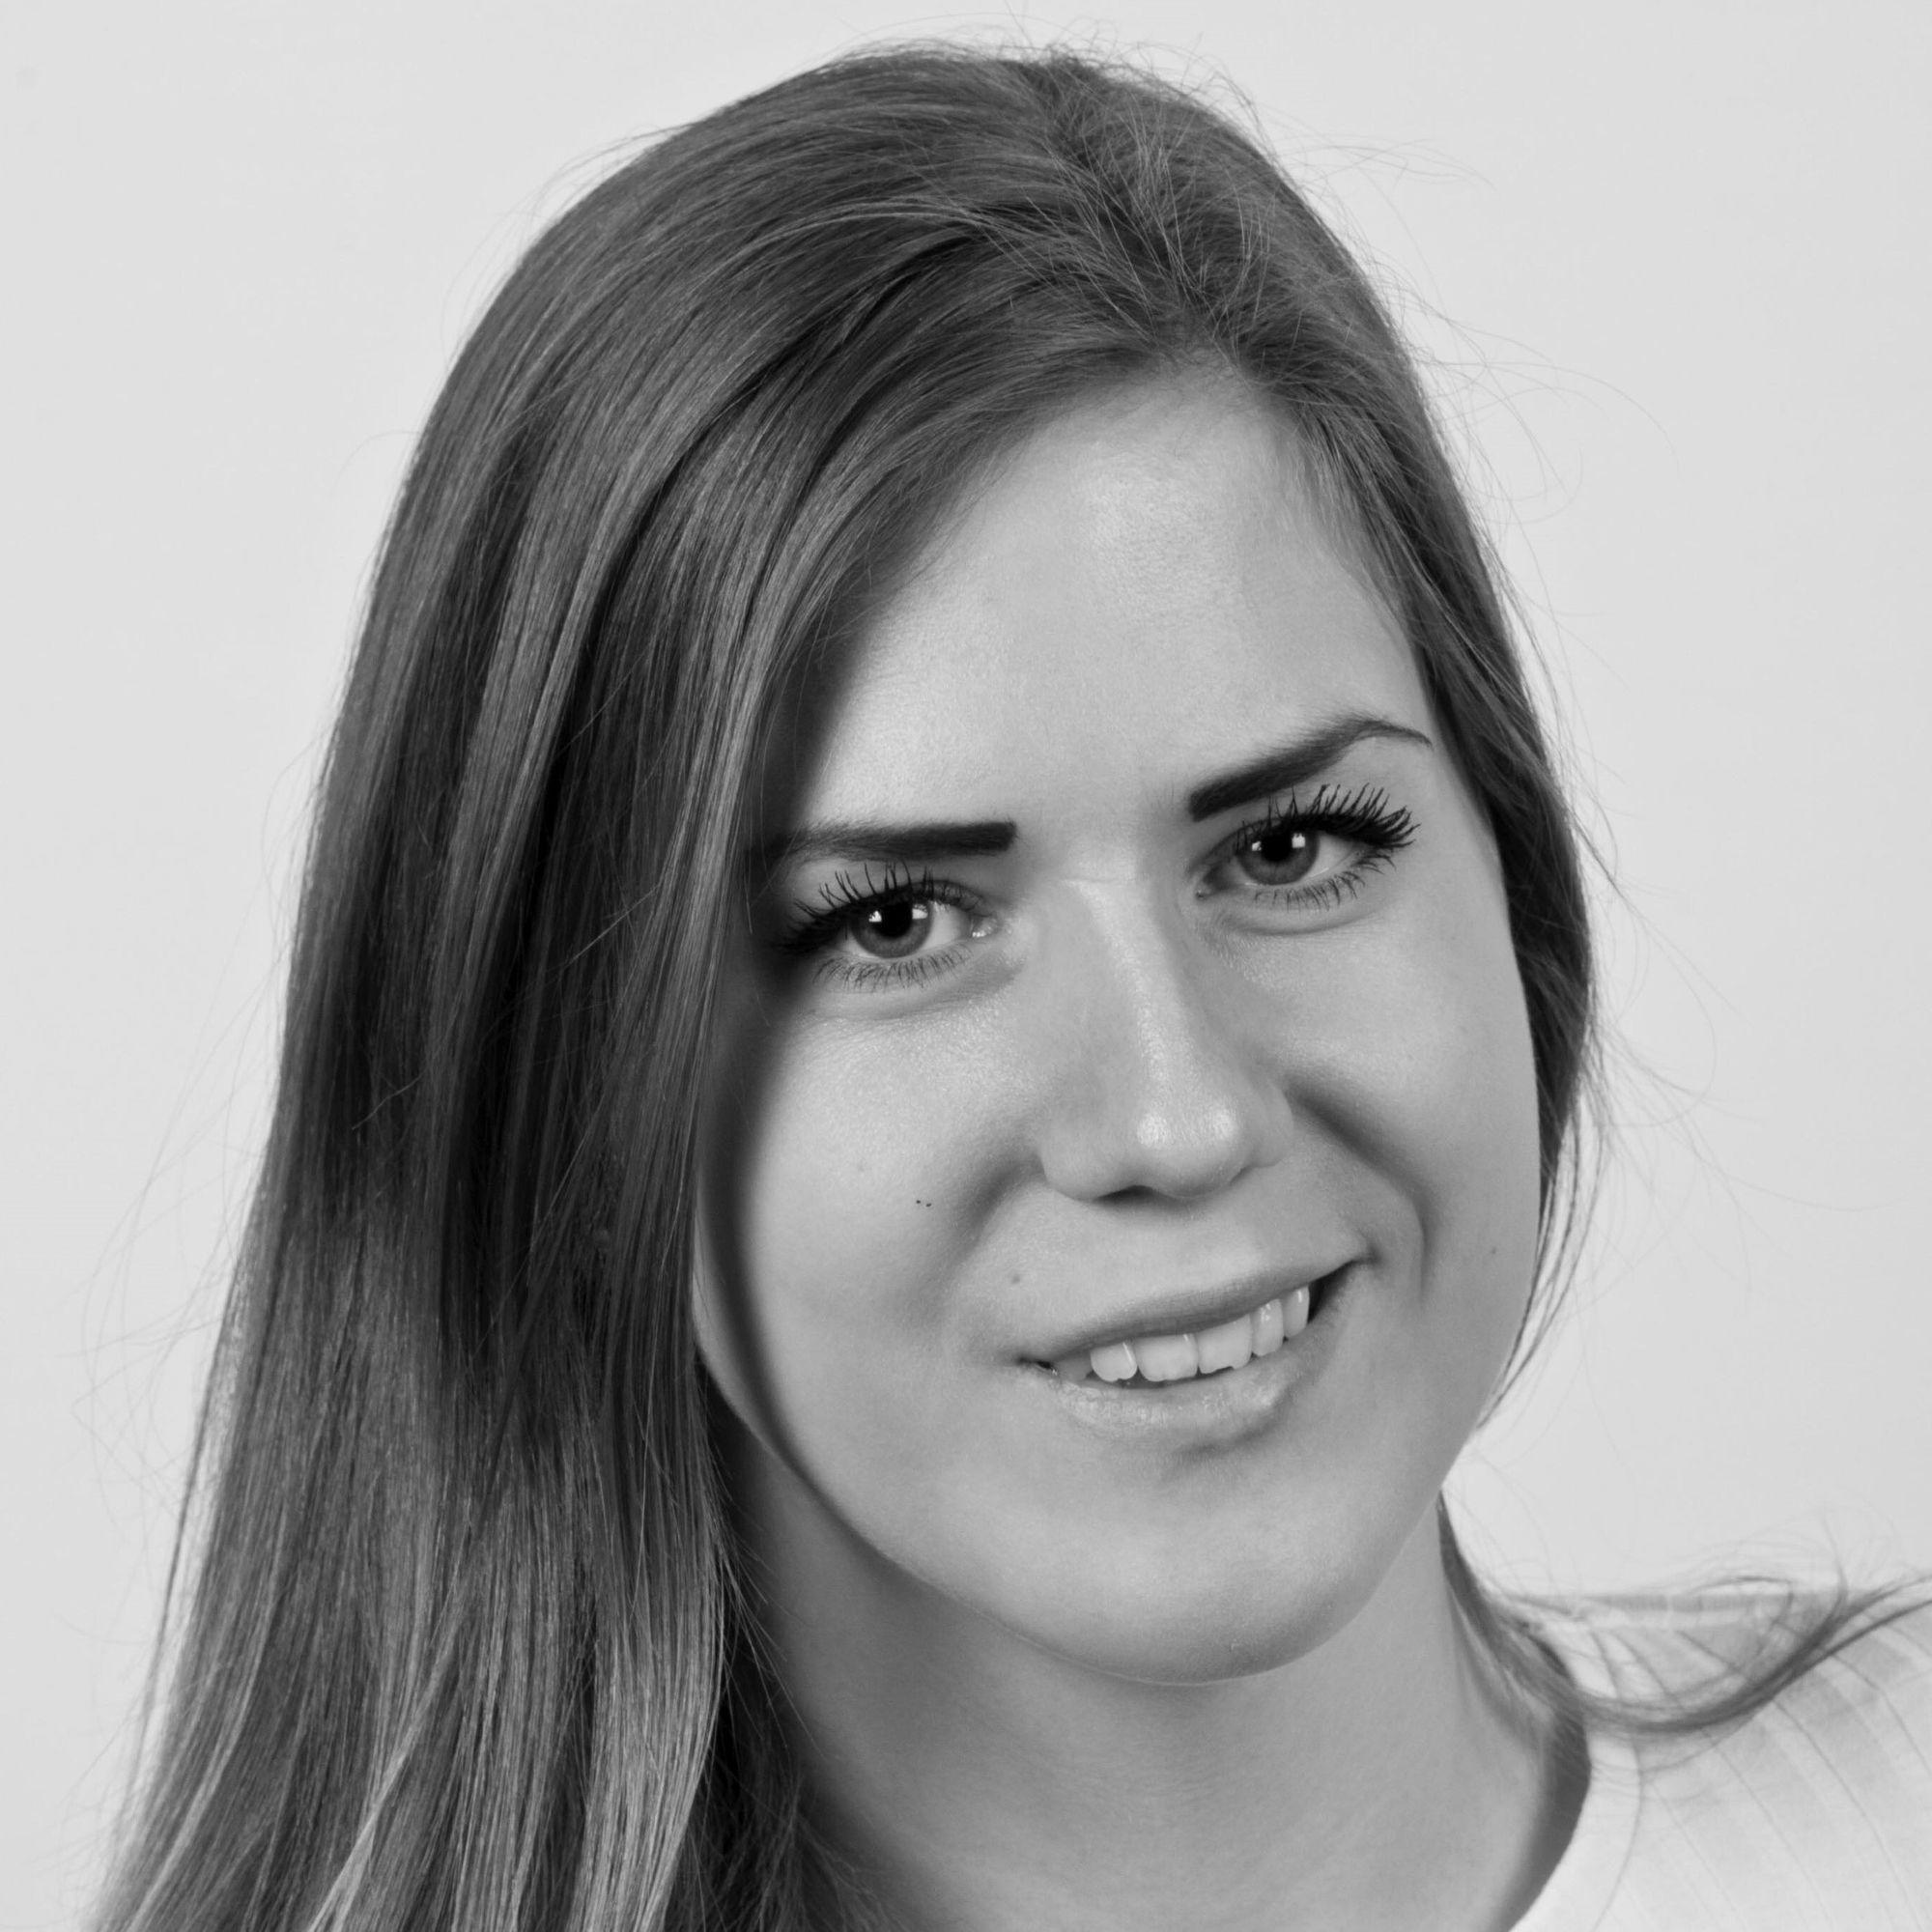 Andrea Sofie Nilssen